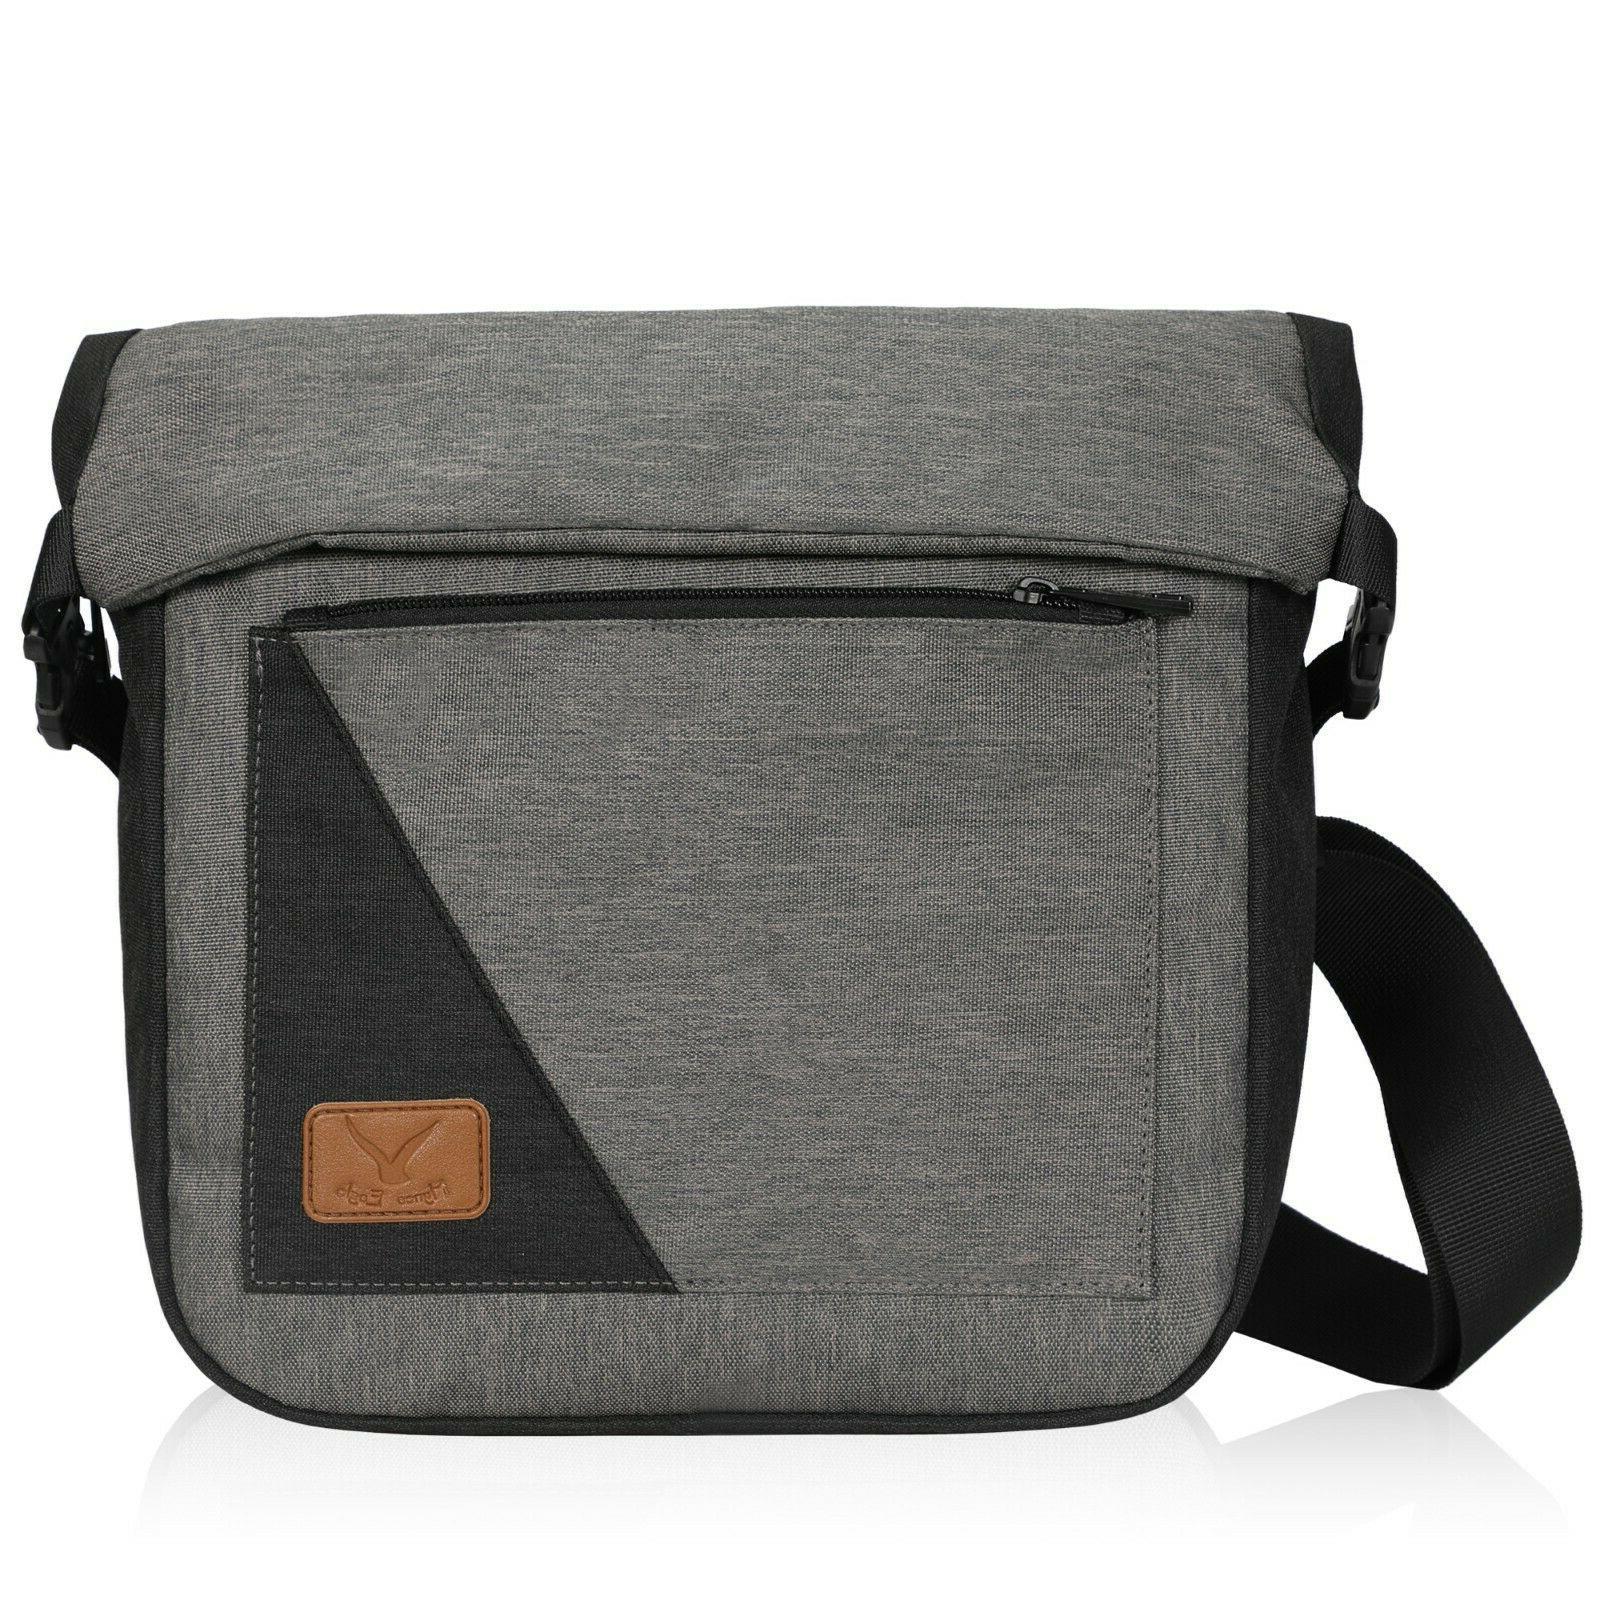 Anti Theft Crossbody Purse Bag